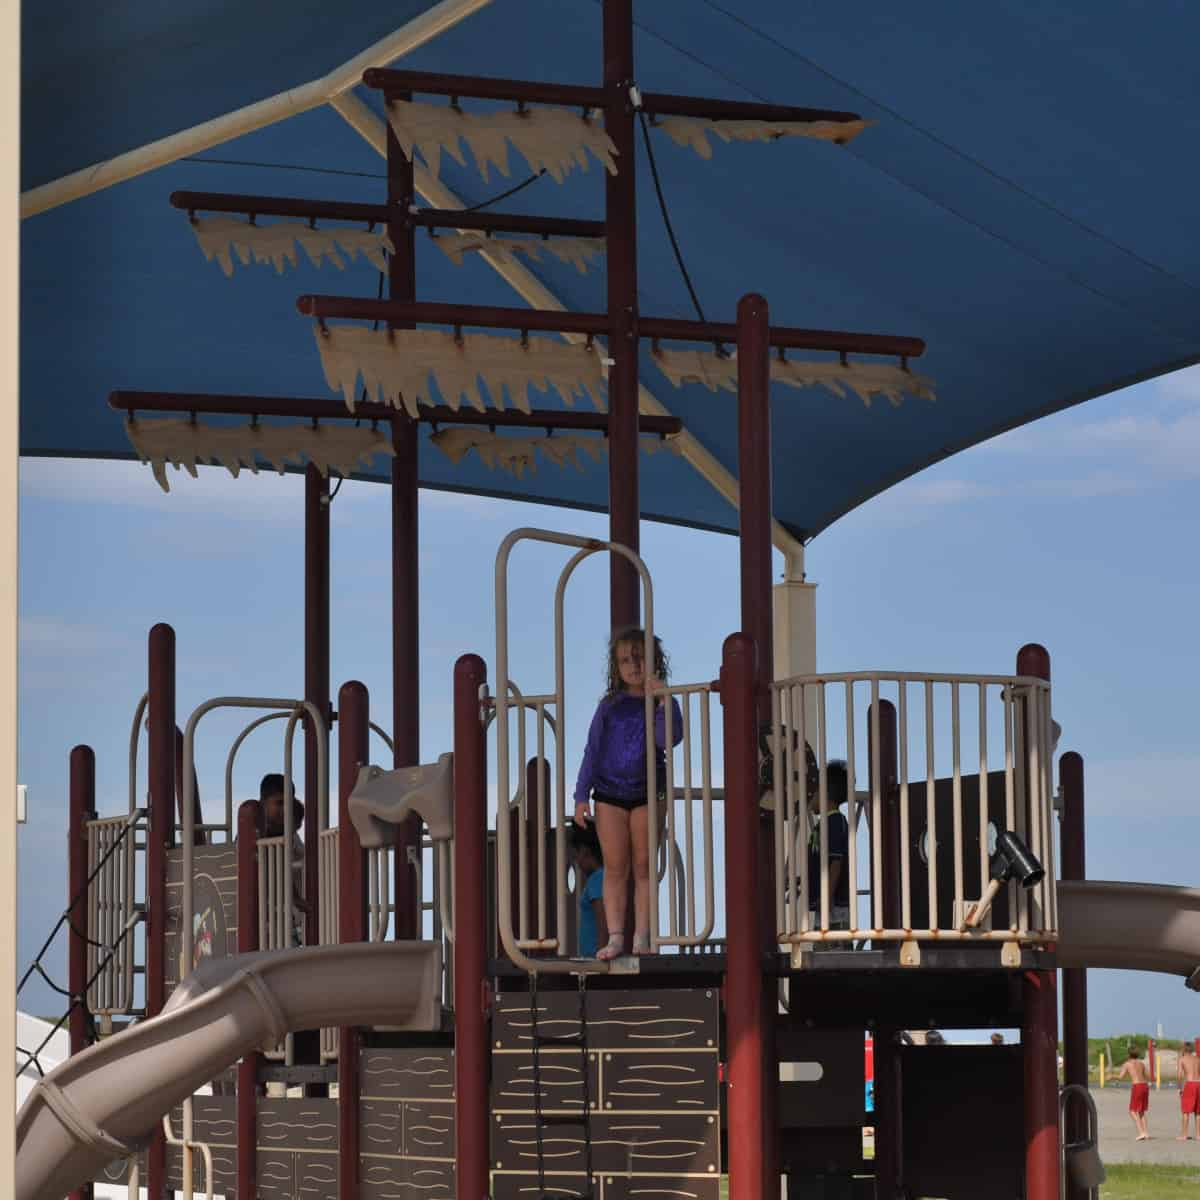 Stewart Beach Pirate Ship Playground